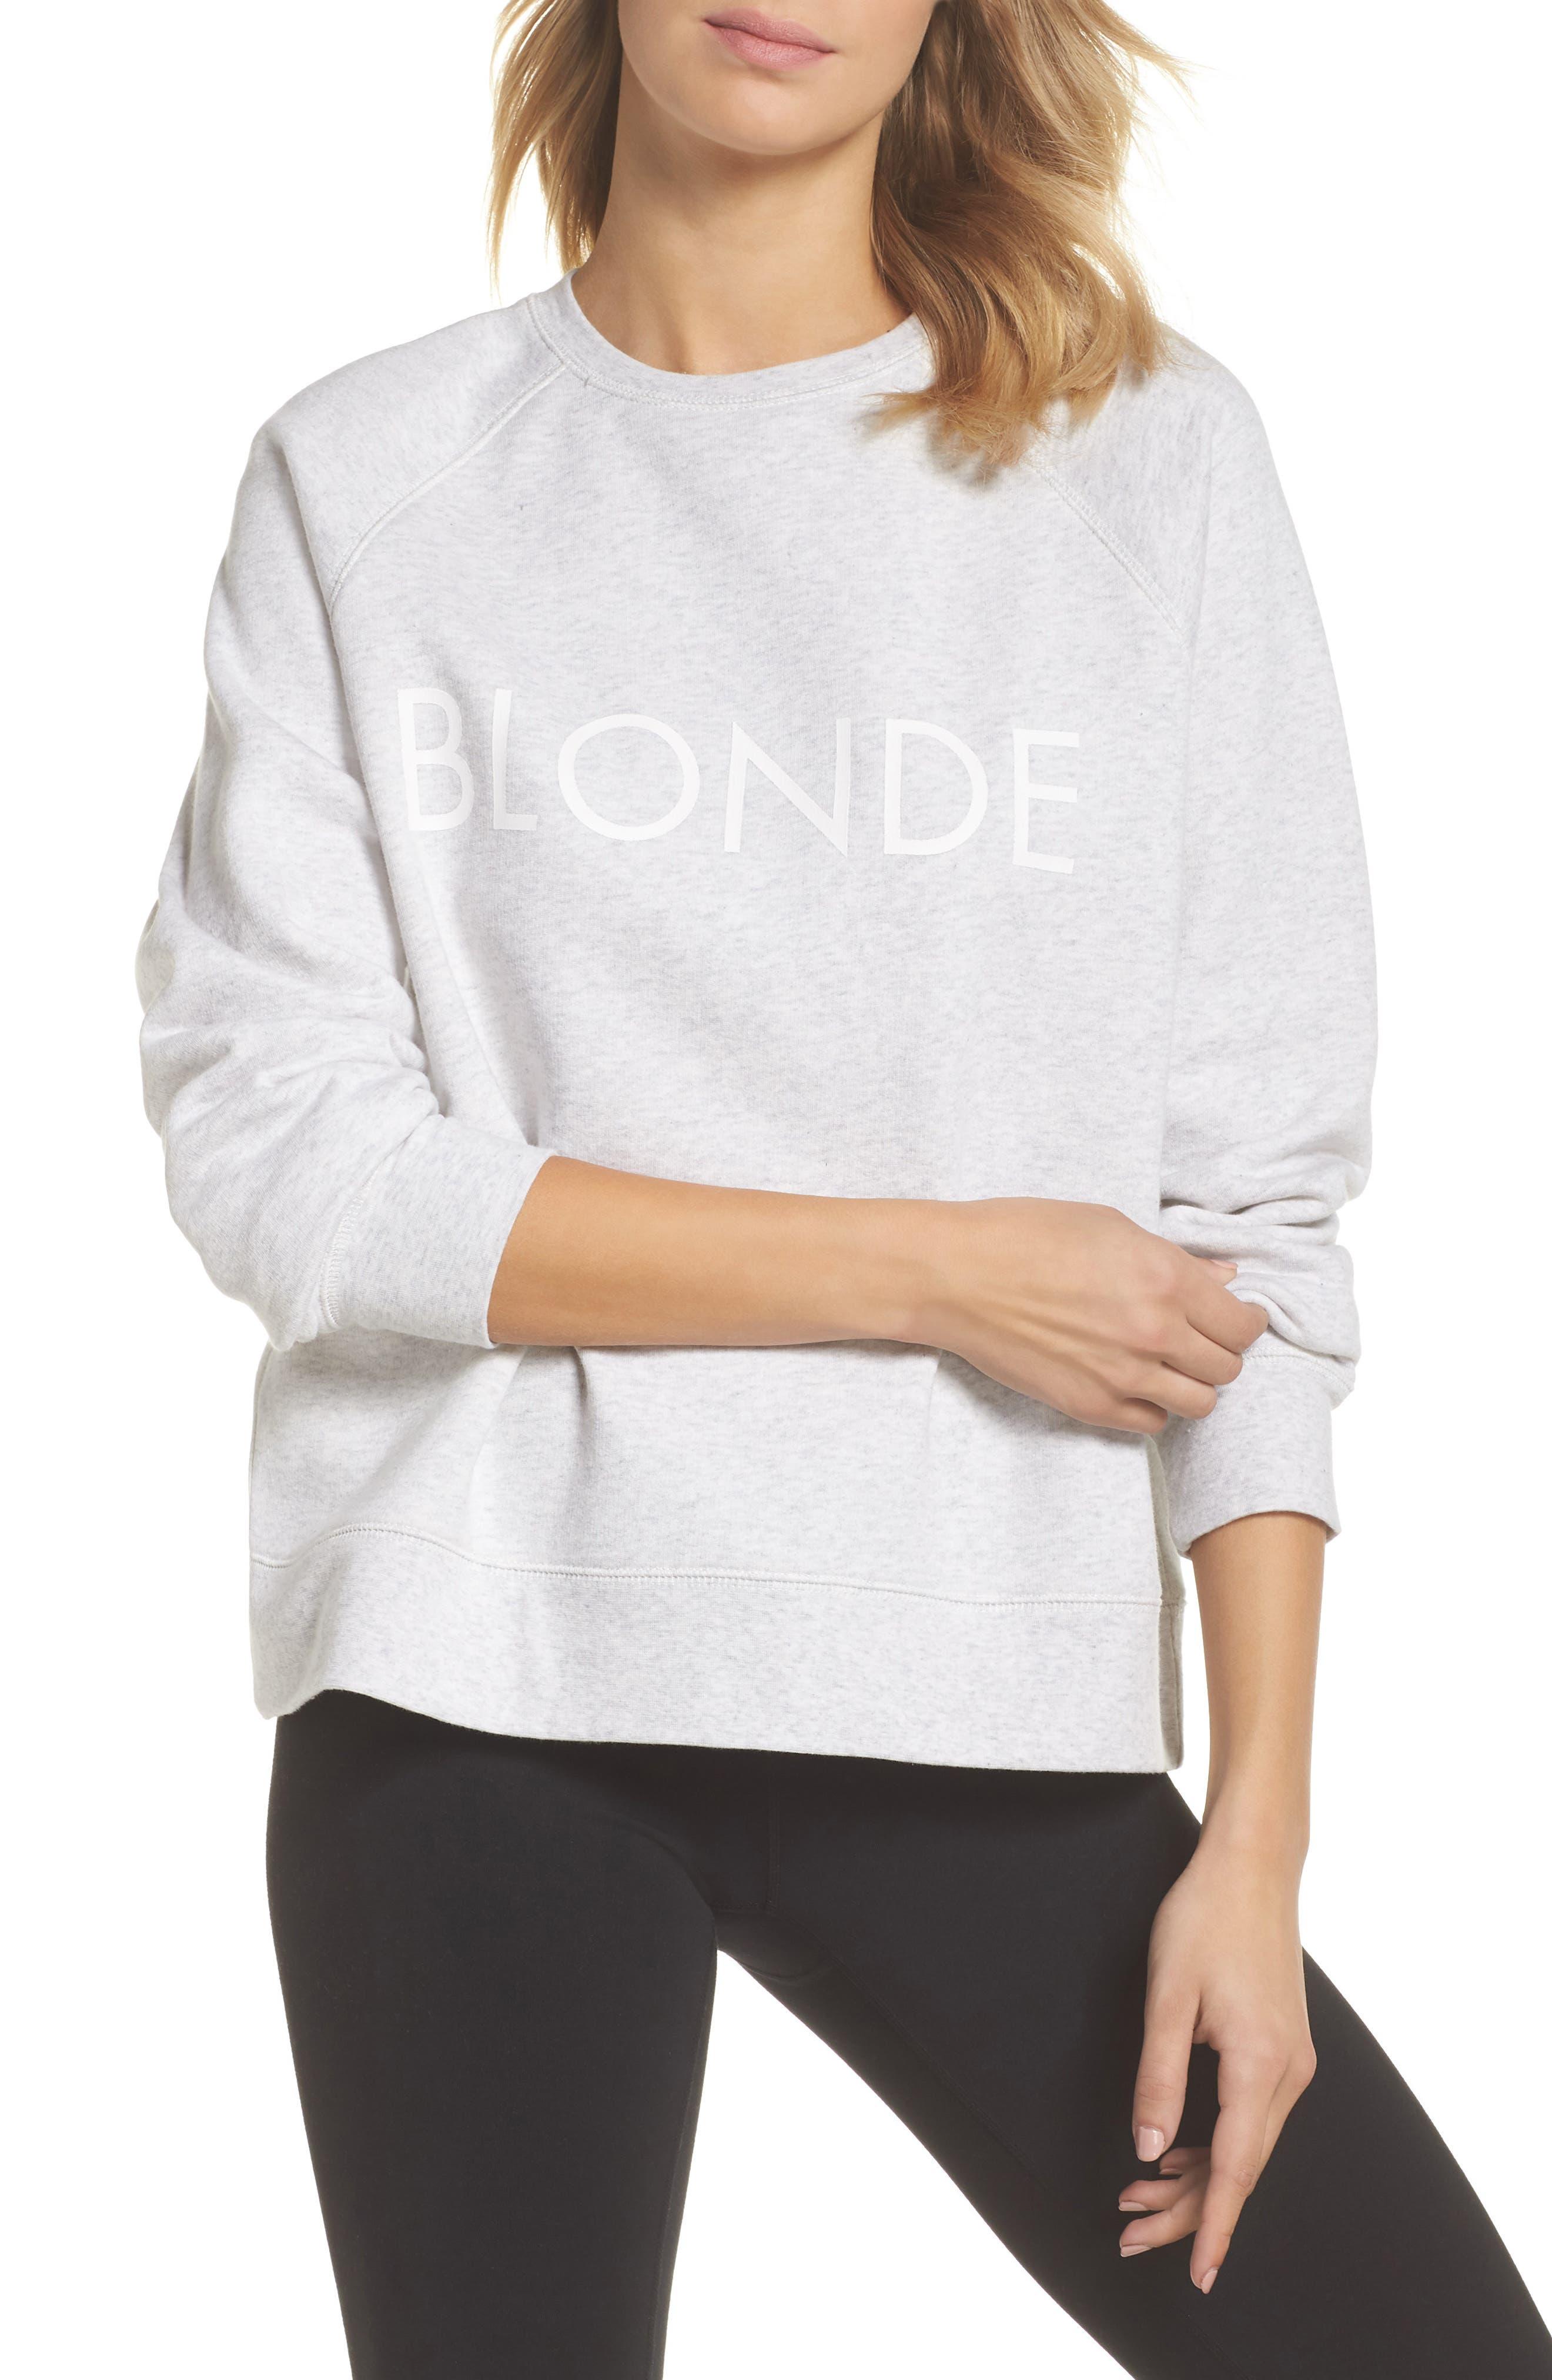 Blonde Sweatshirt,                             Main thumbnail 1, color,                             250